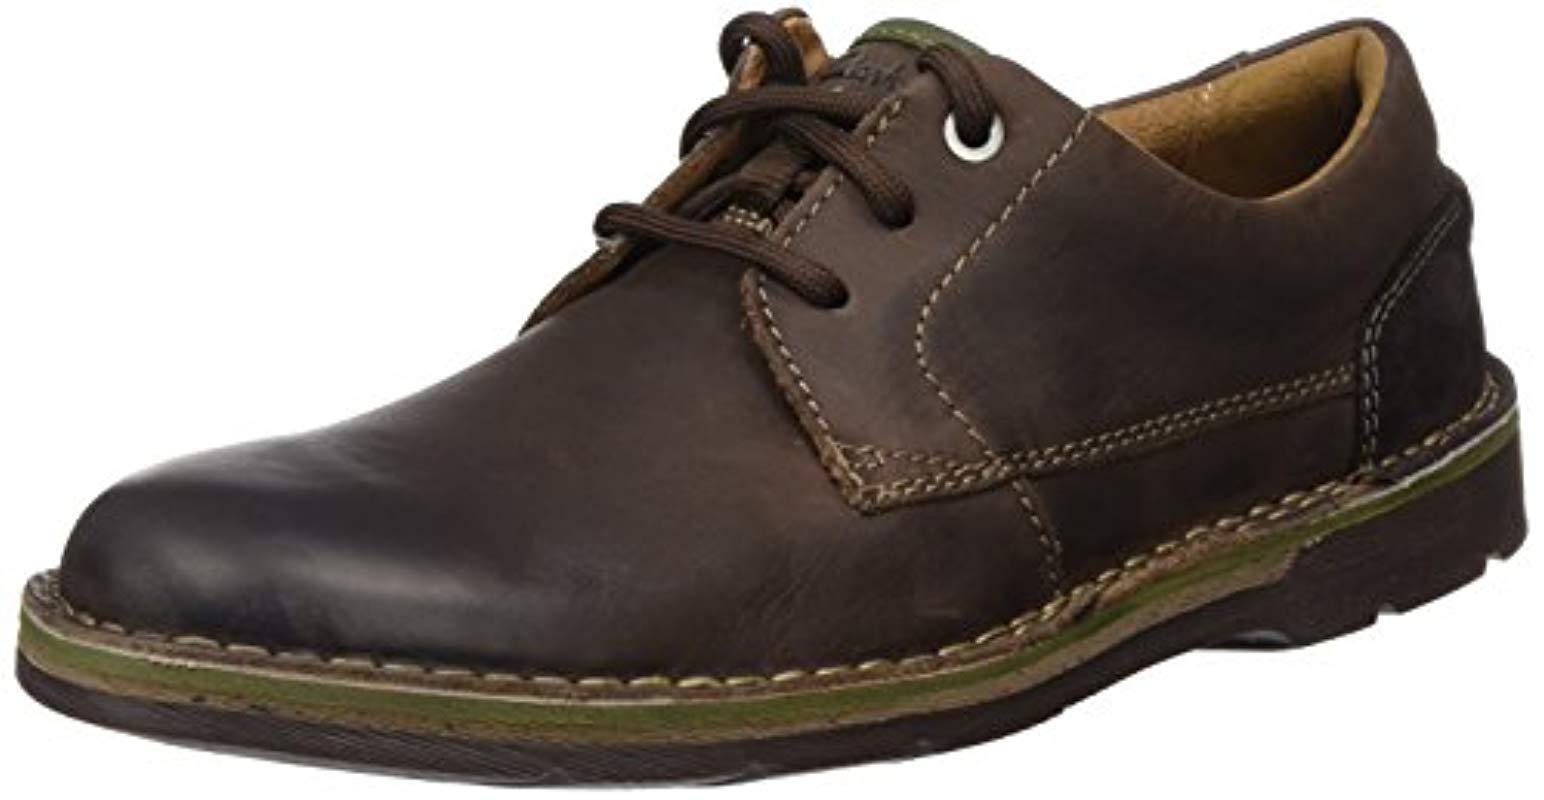 1615b353 Edgewick Plain, Zapatos de Cordones Derby para Hombre Clarks de ...